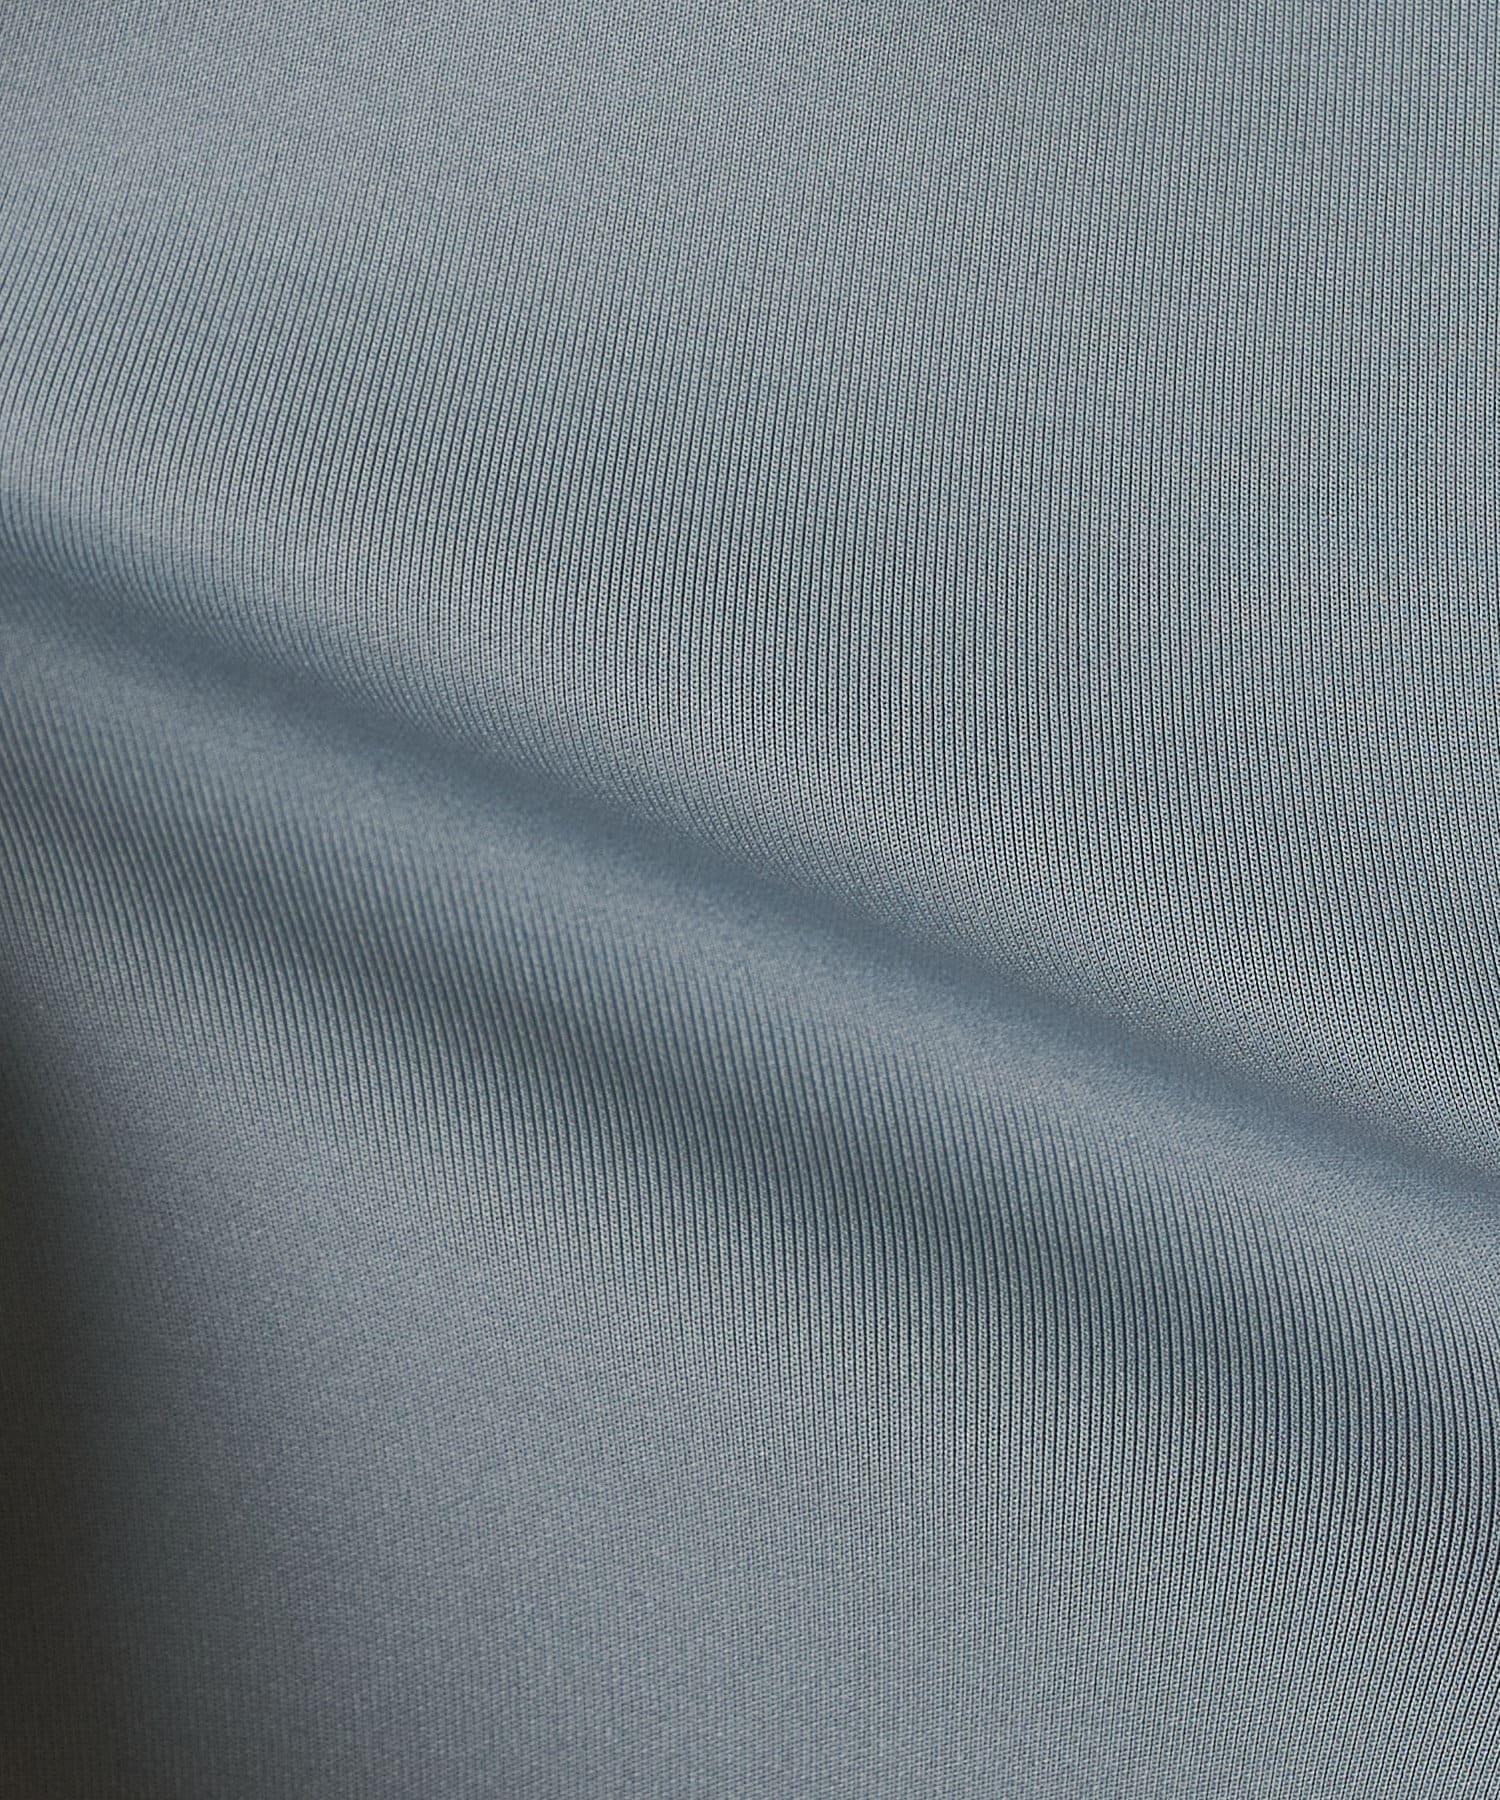 BEARDSLEY(ビアズリー) 《動画付き》ウエストテレコダンボールスカート